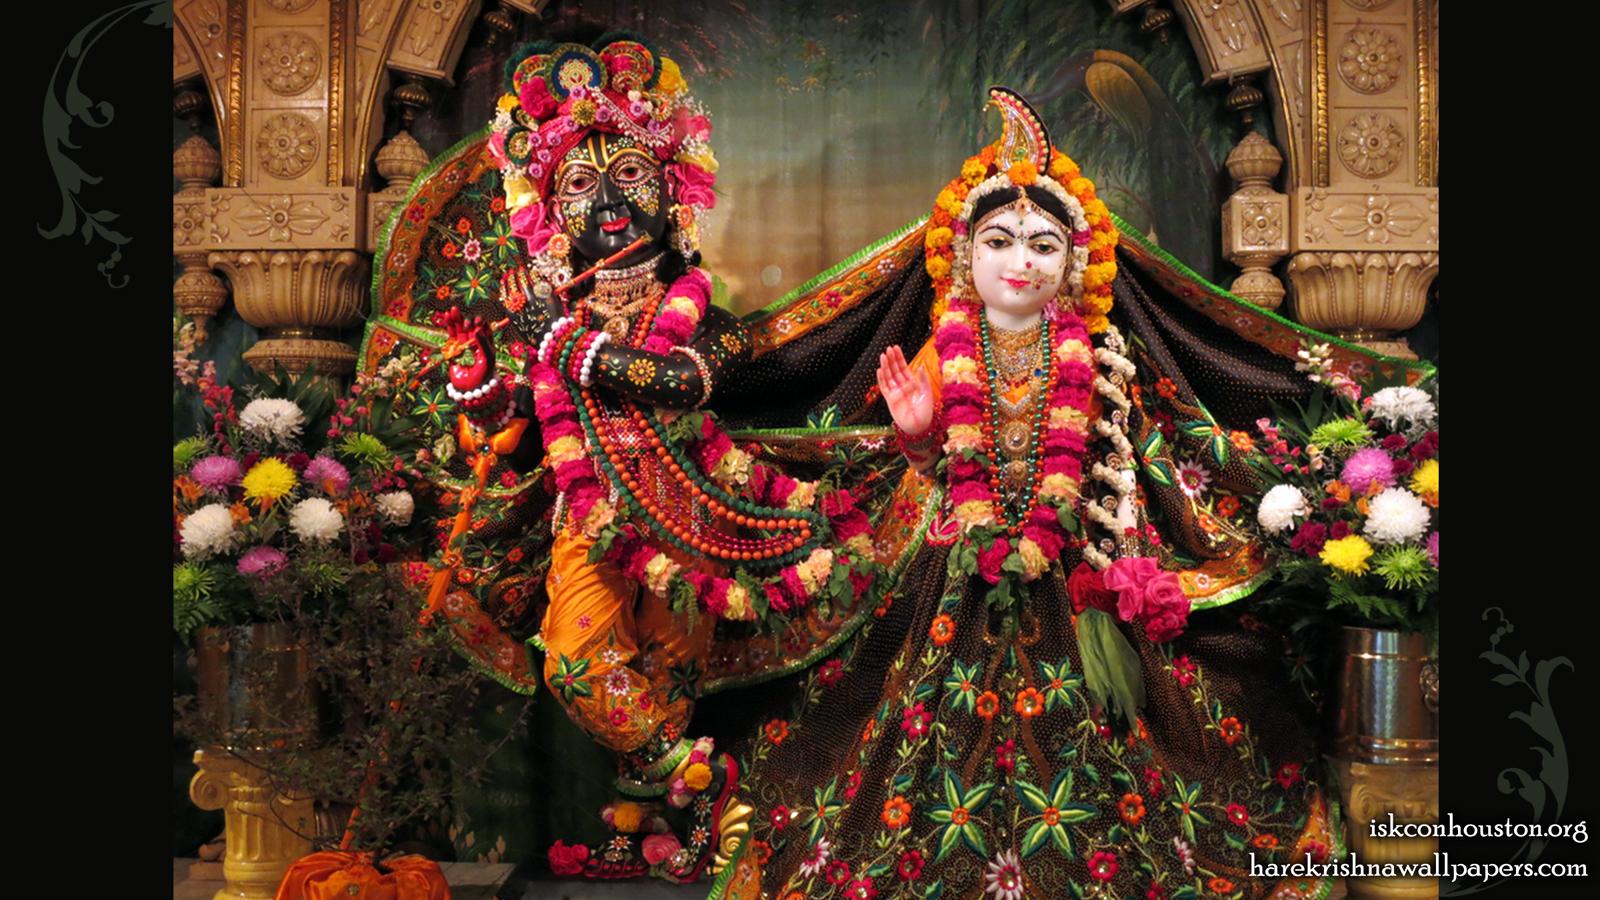 Sri Sri Radha Nilamadhava Wallpaper (007) Size 1600x900 Download